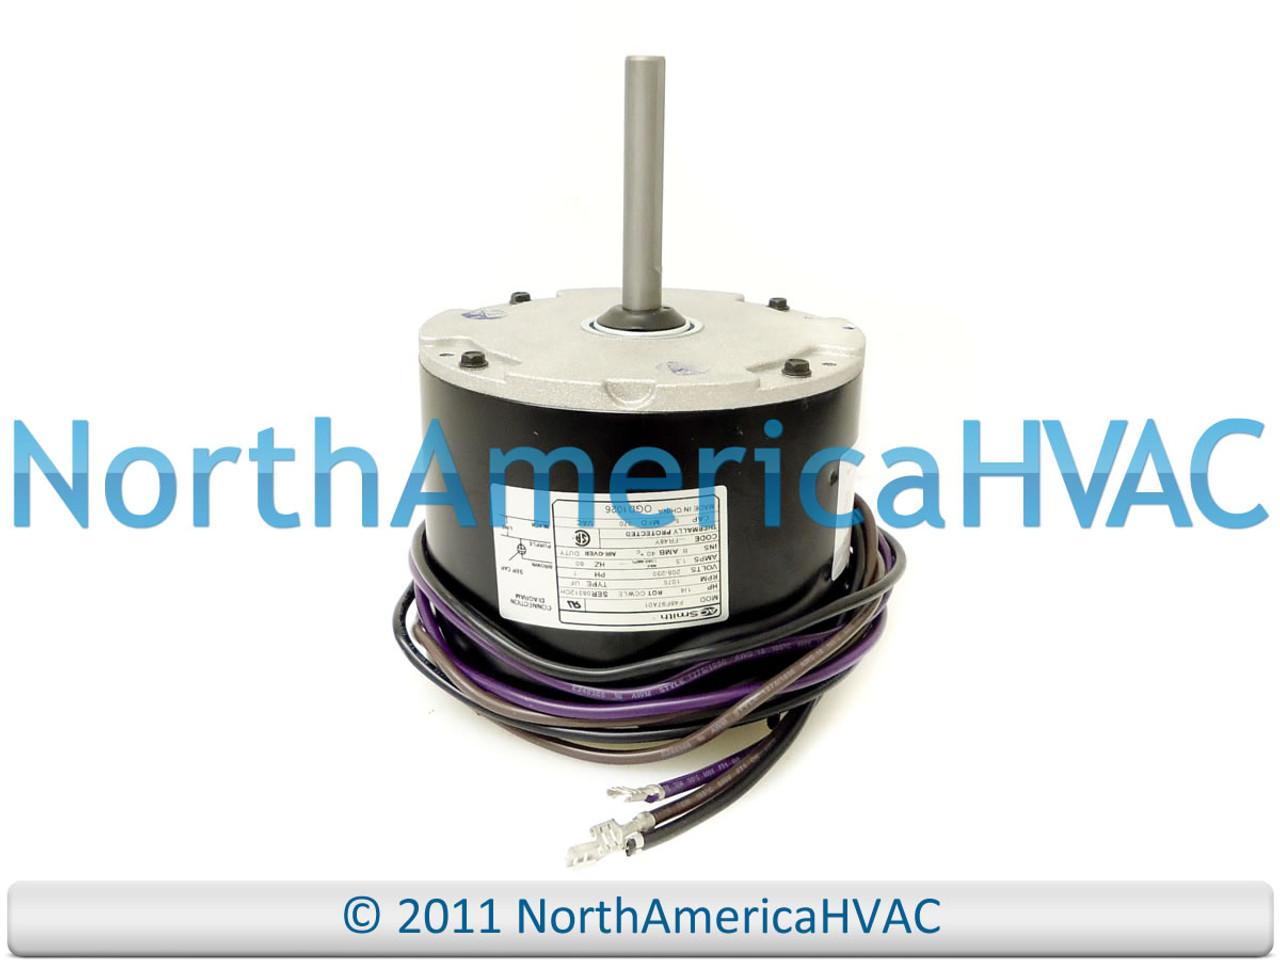 CPKE36 1A CK36 1 2x 5 MFD 370 Volt Oval Motor Run Capacitor for Goodman CK36 1B